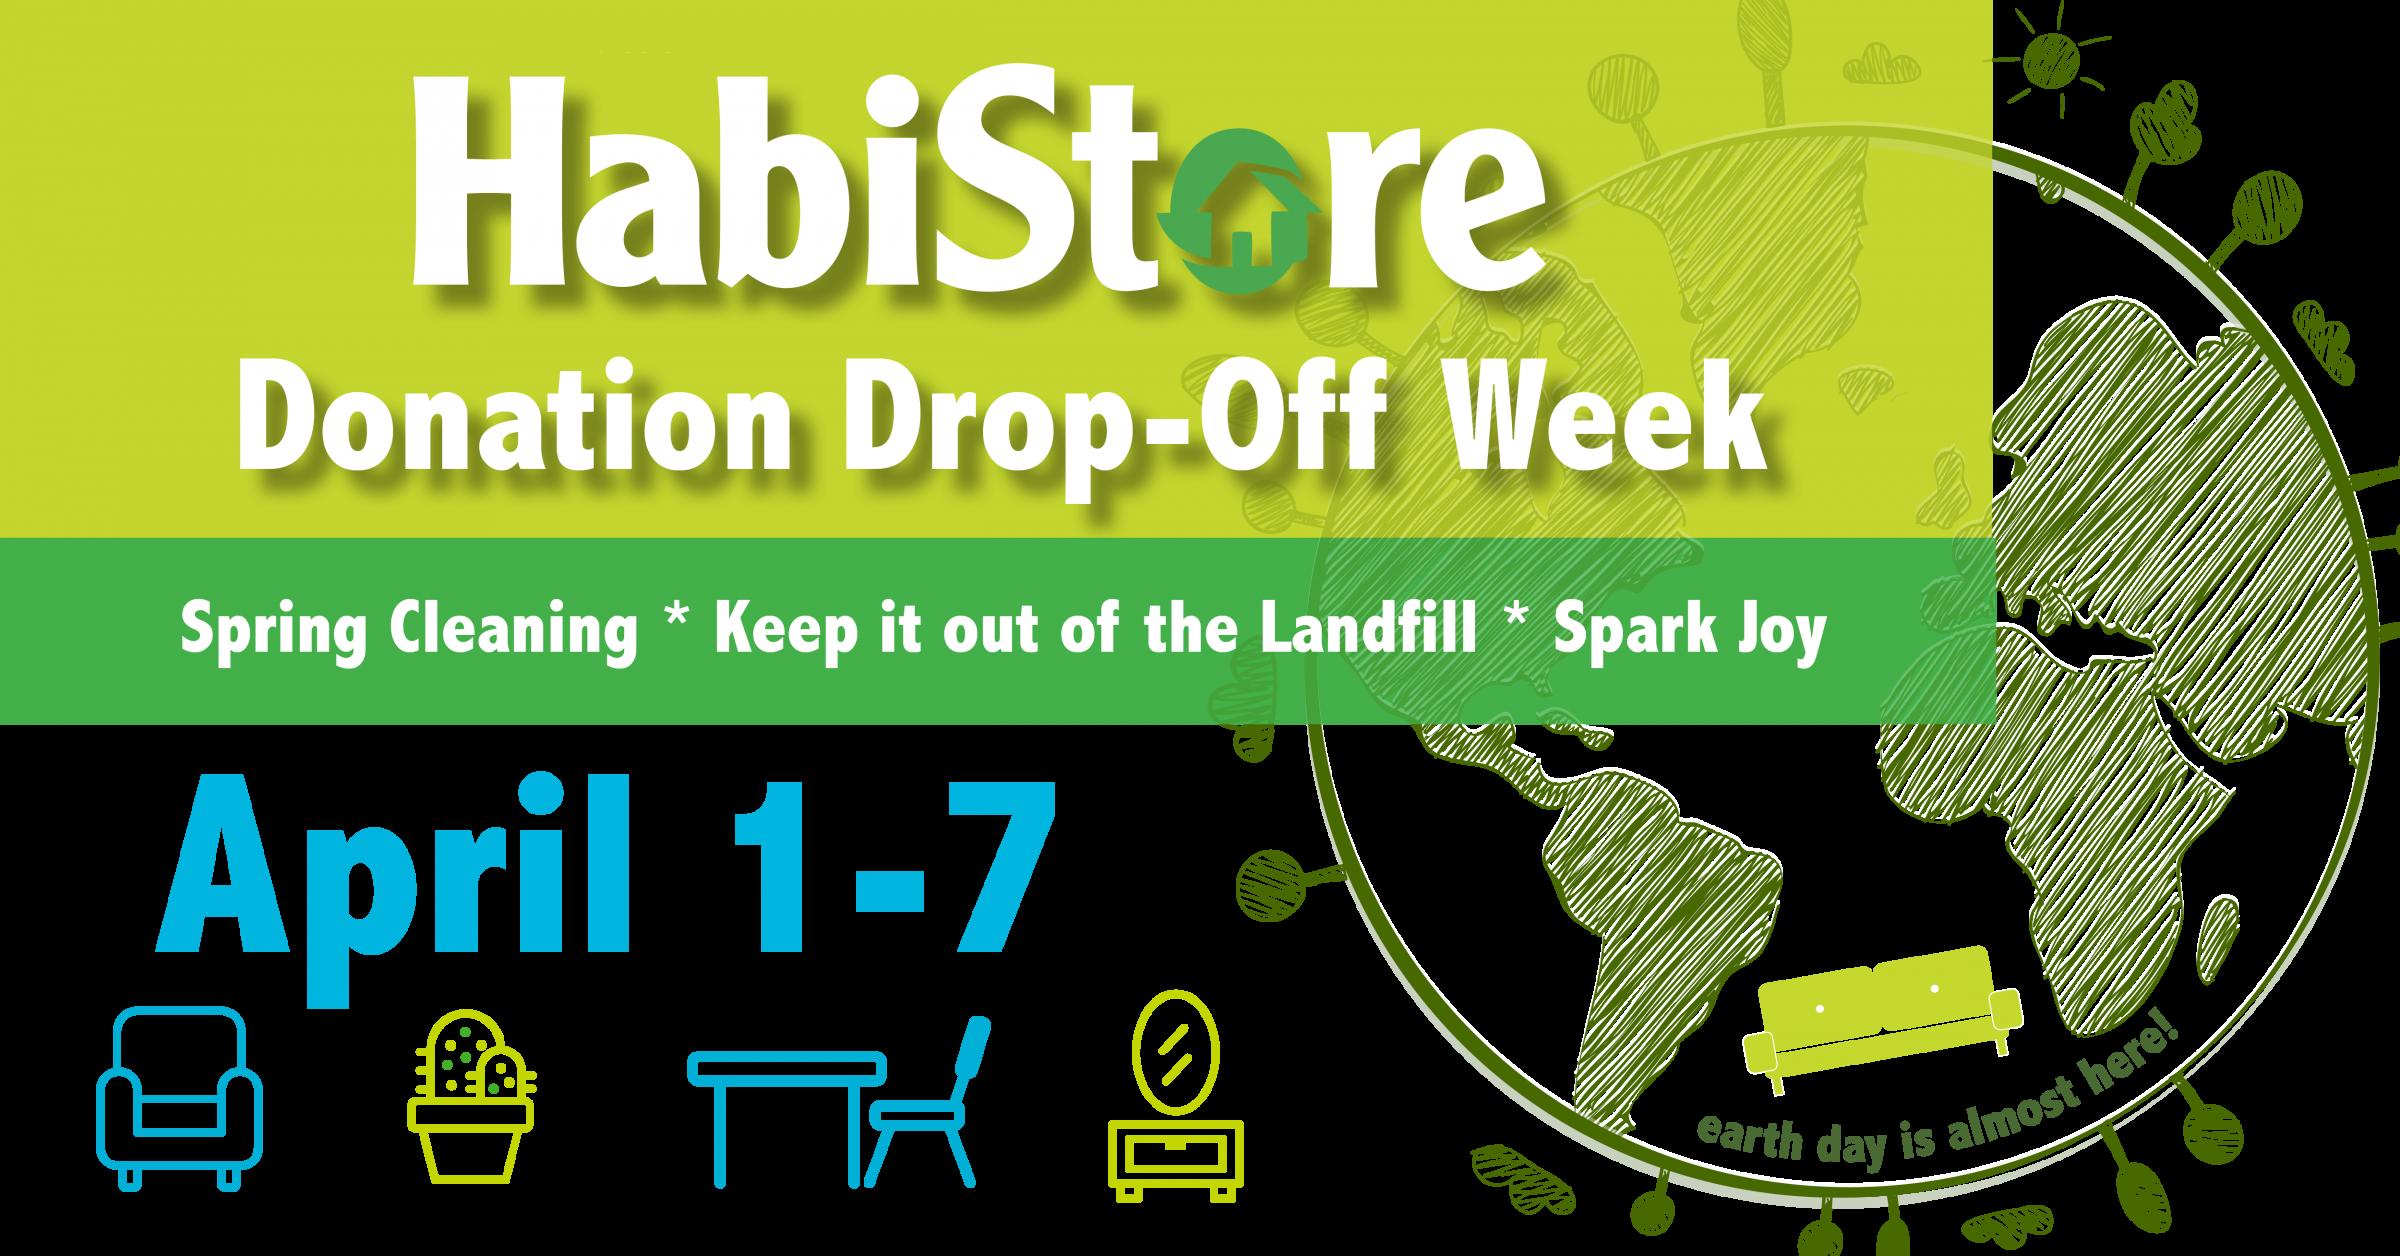 donation-drop-off-week-fb-event-2.25.19